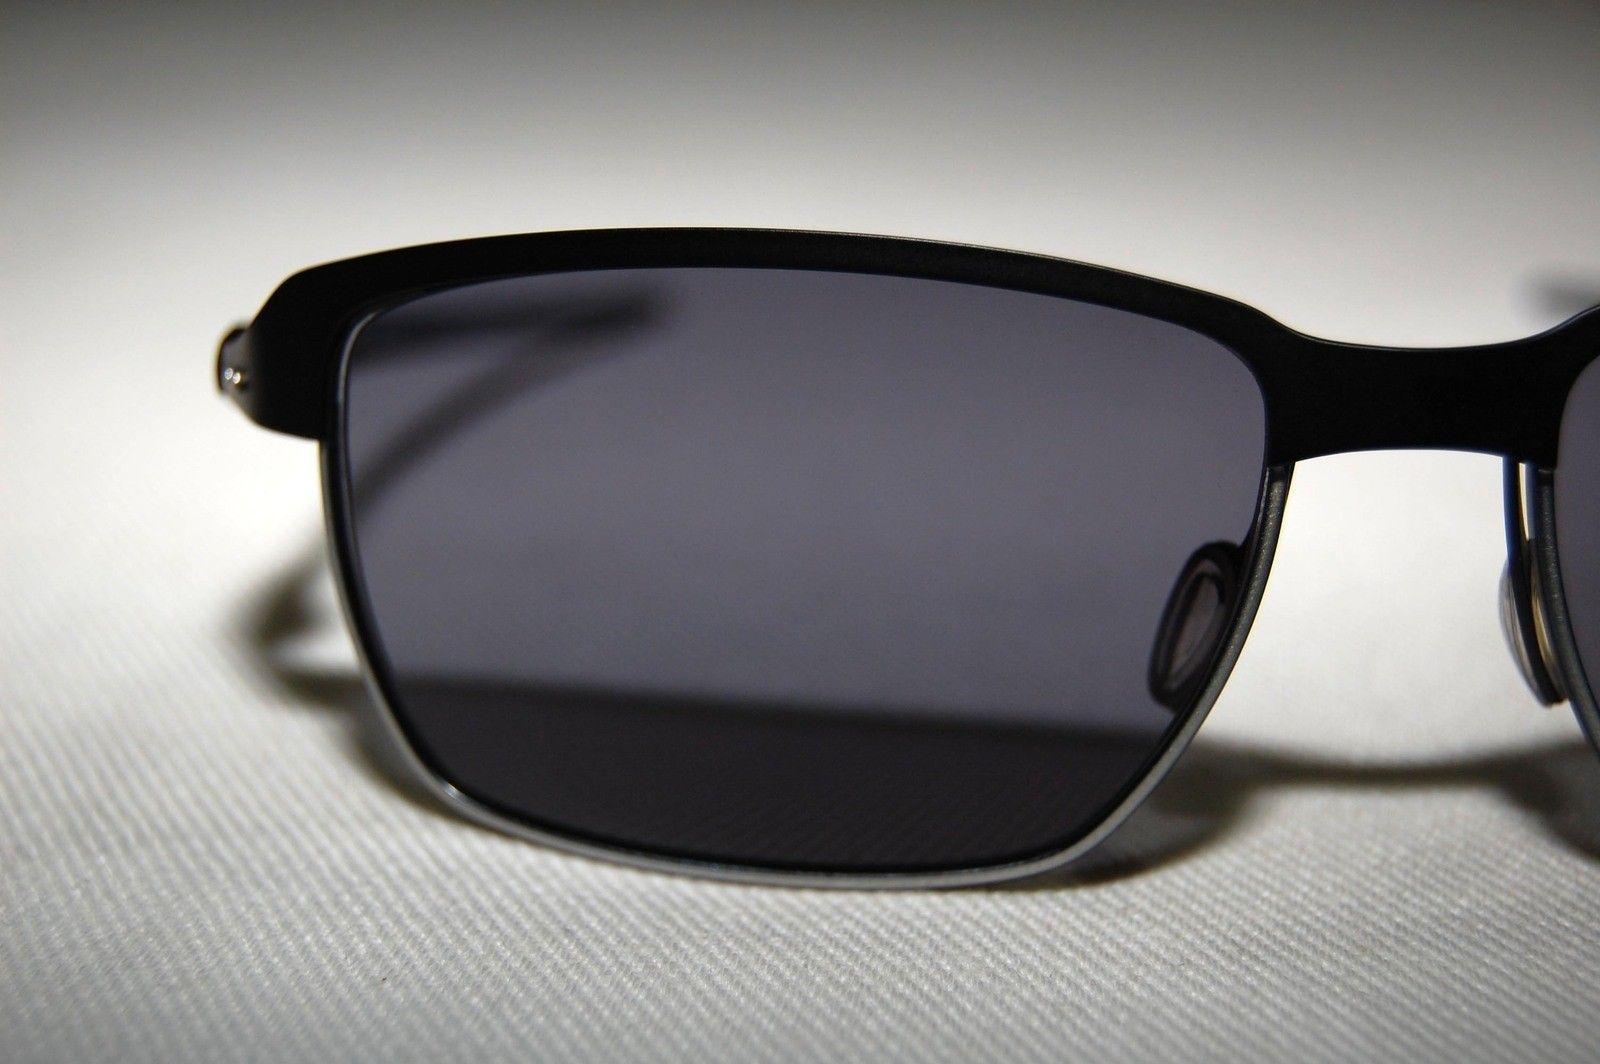 Tinfoil Carbon OO6018-01 Matte Black / Silver | Grey Lens - 06.jpg